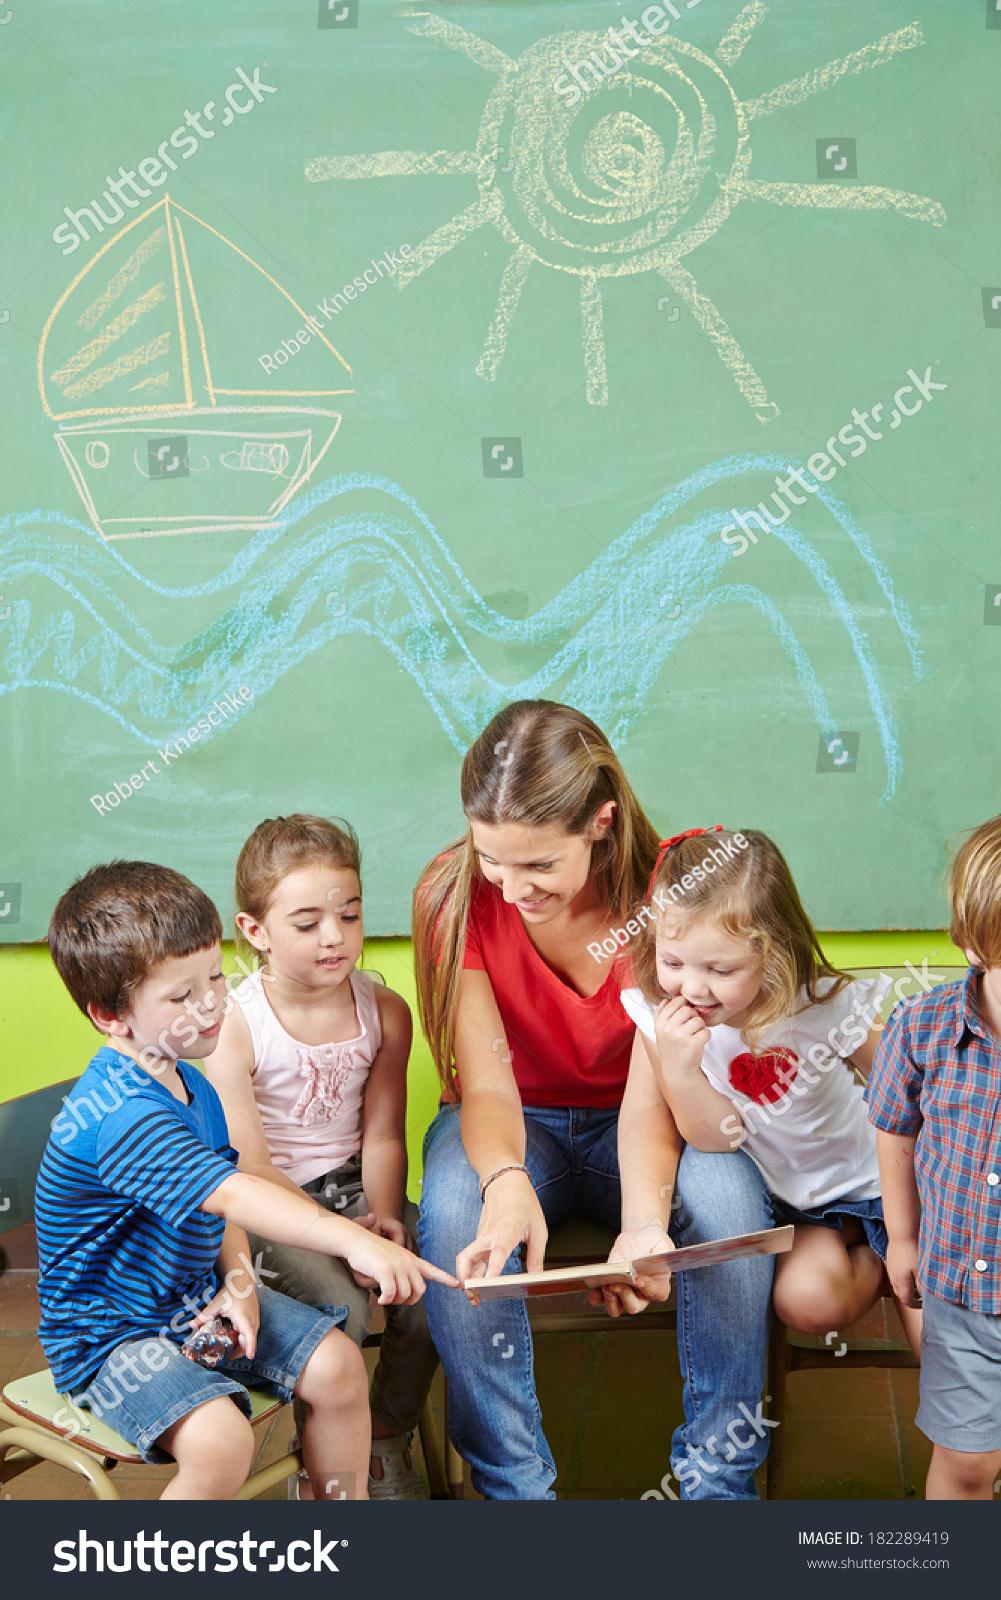 Children In Preschool Reading Book Together With A Nursery Teacher